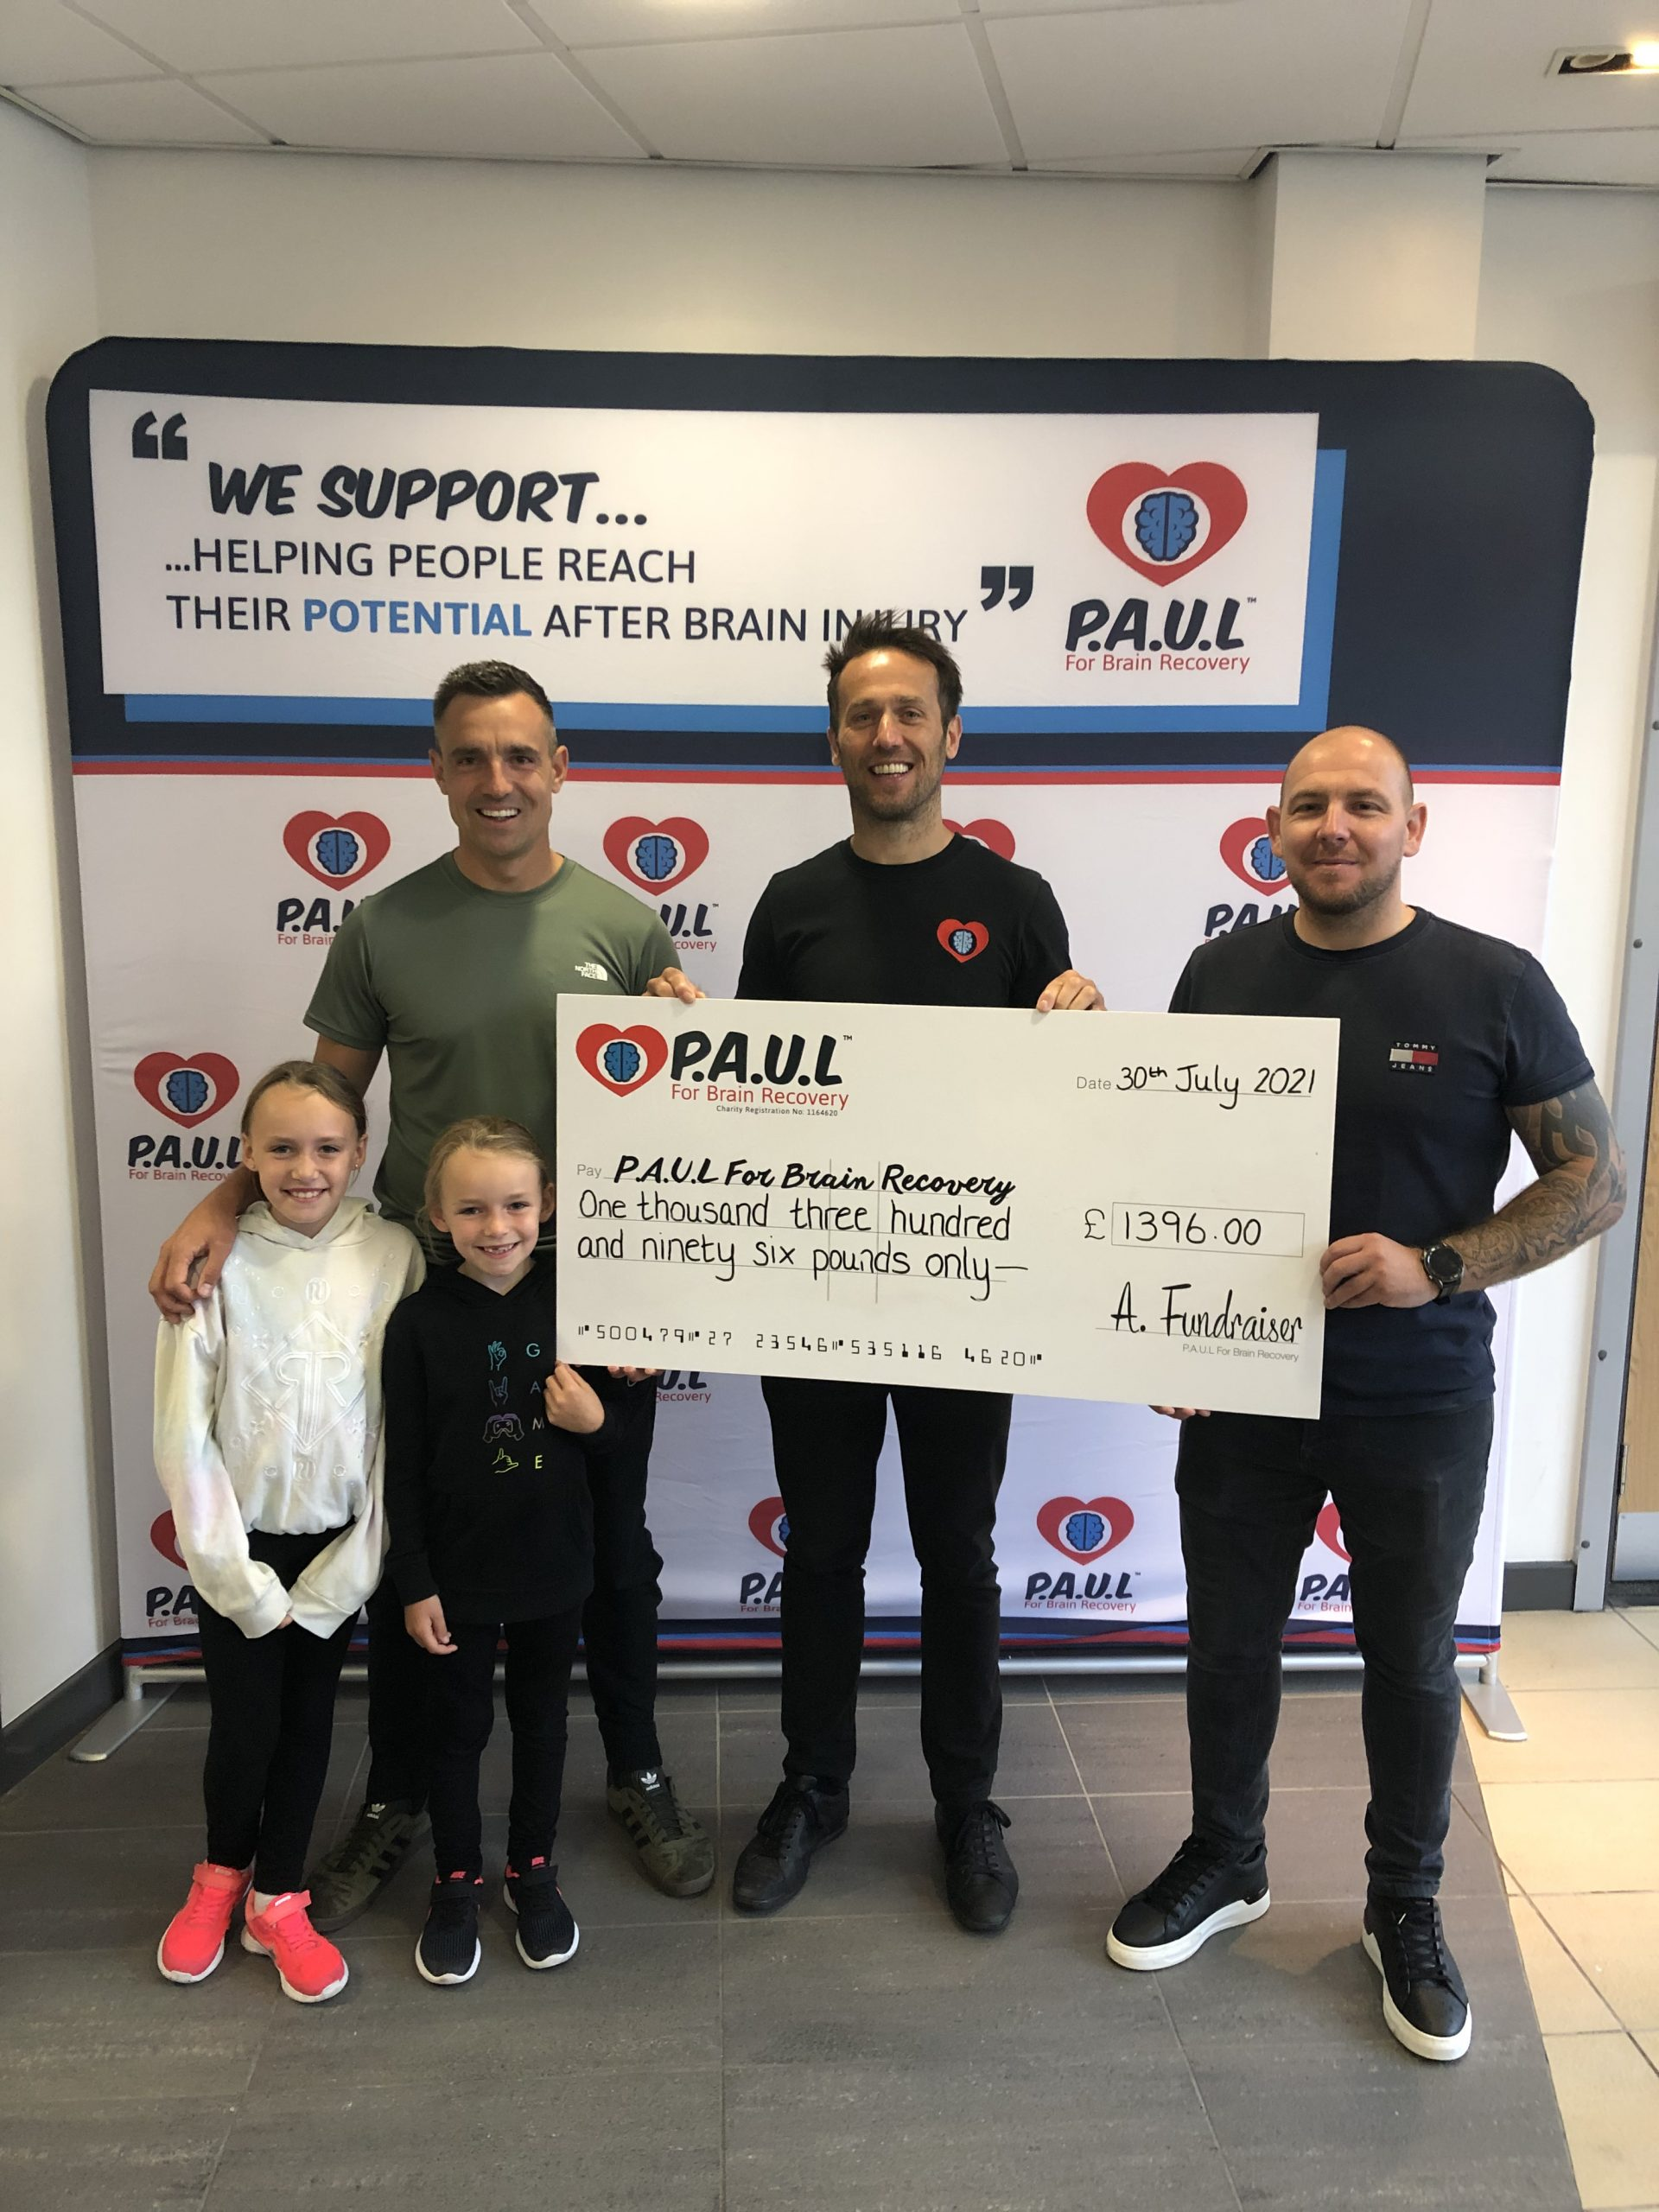 Paul for brain injury charity fundraising